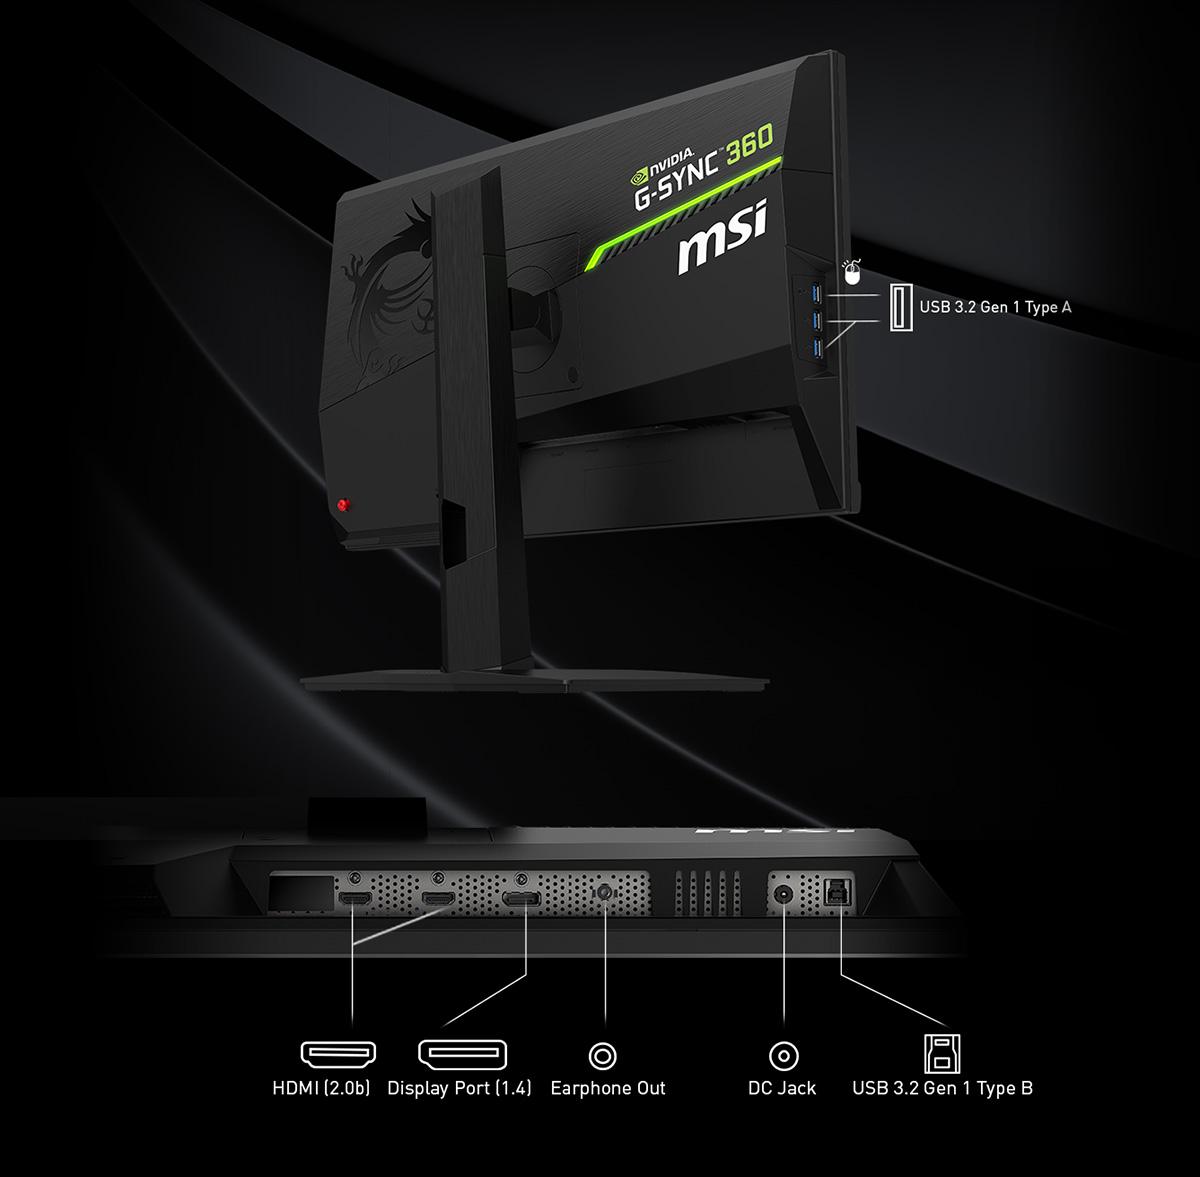 MSI NXG253R monitor back io image